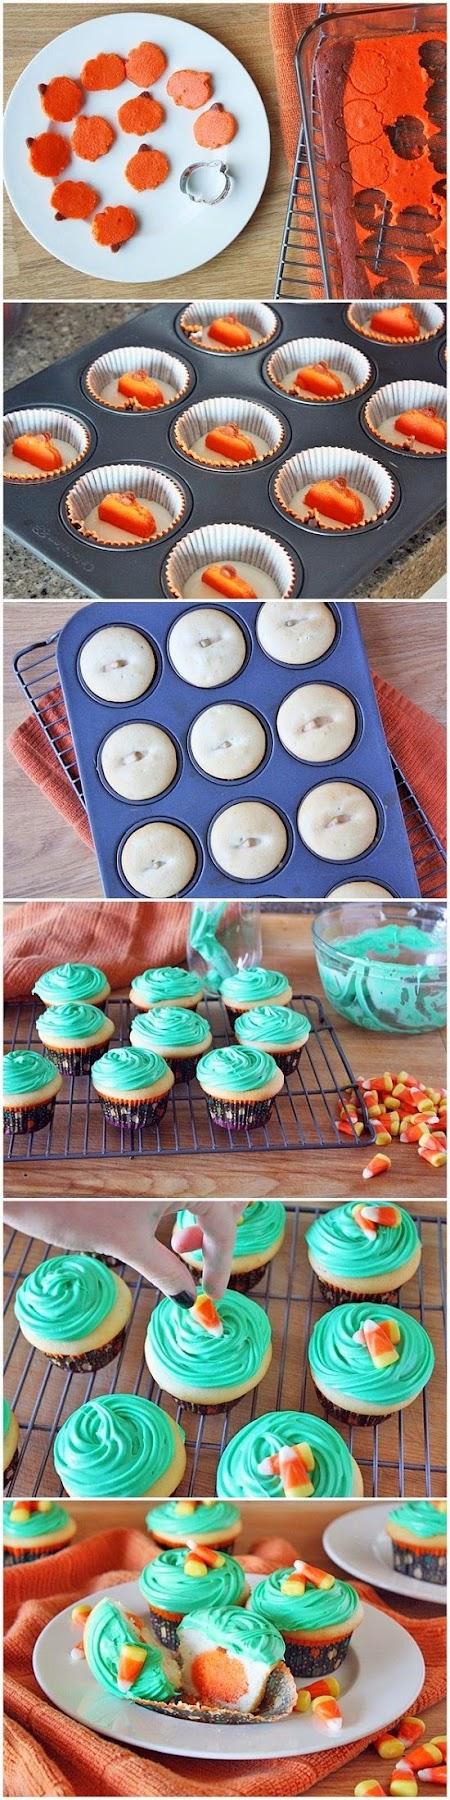 How To Make Boo! Jack O' Lantern Cupcakes